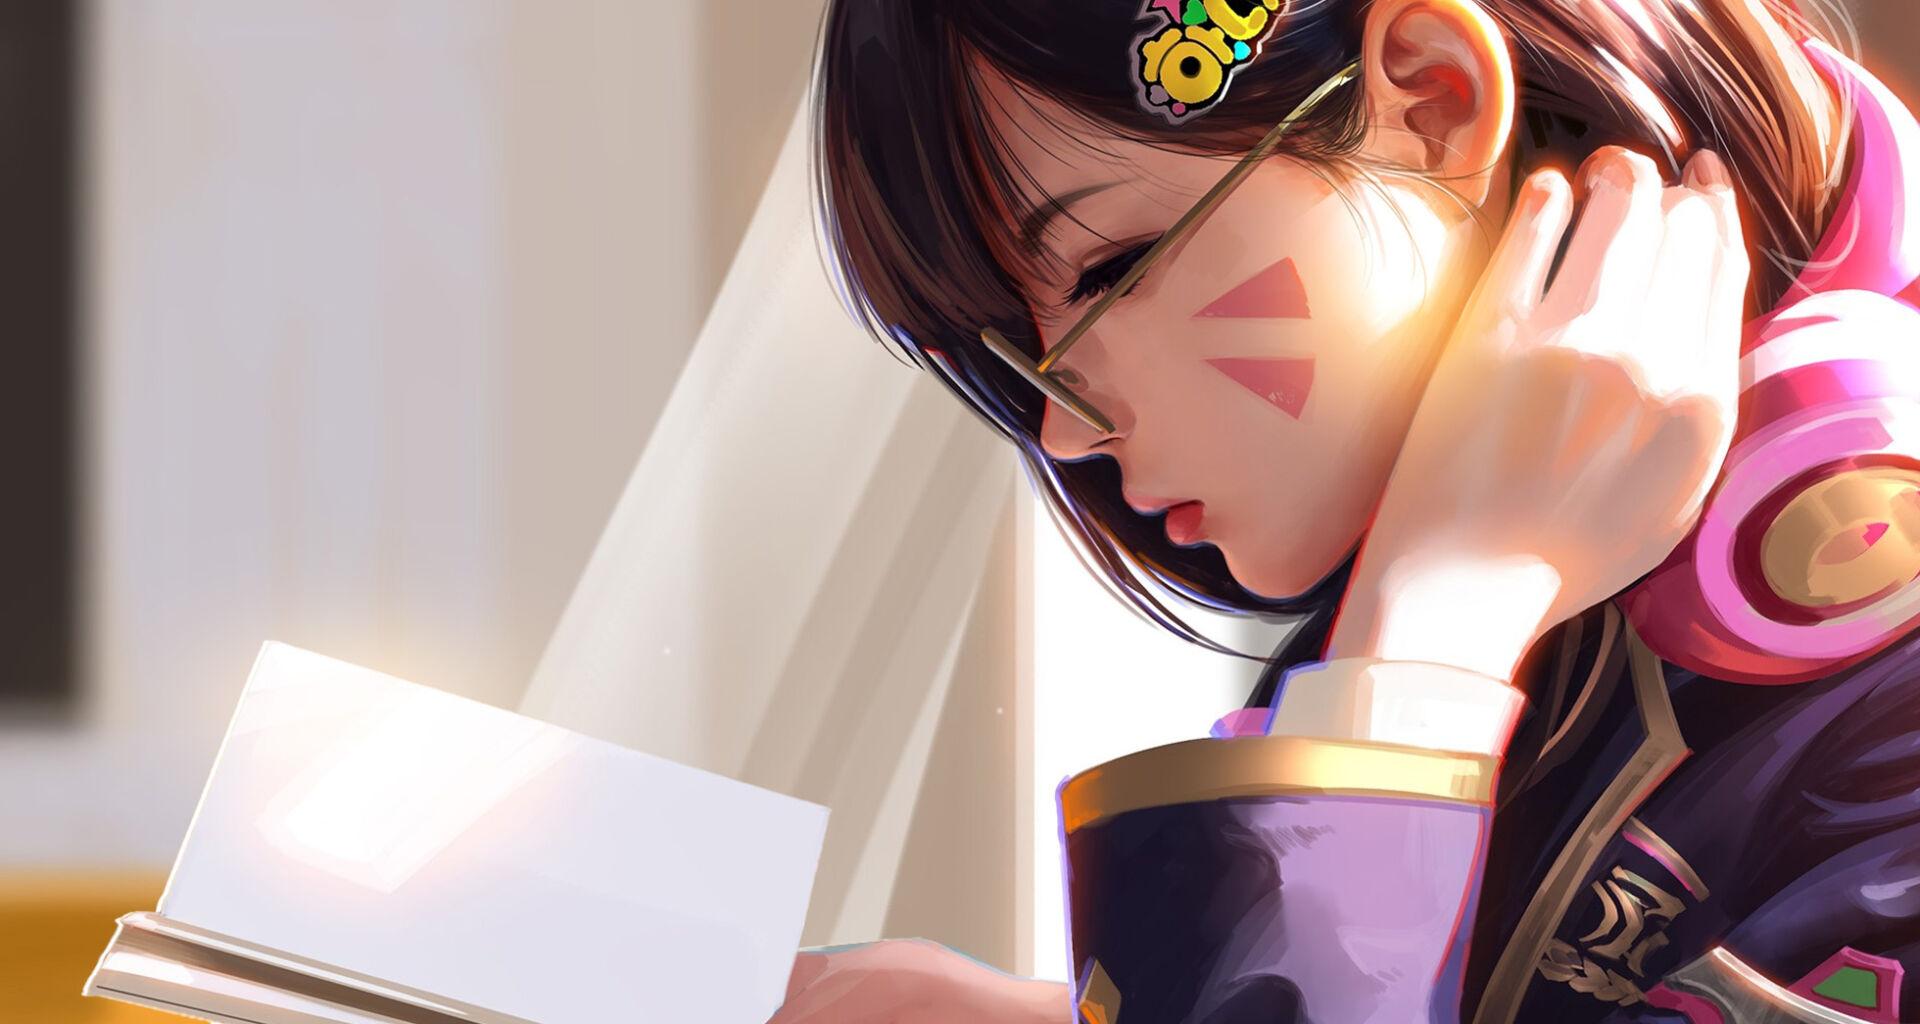 Libros gamer